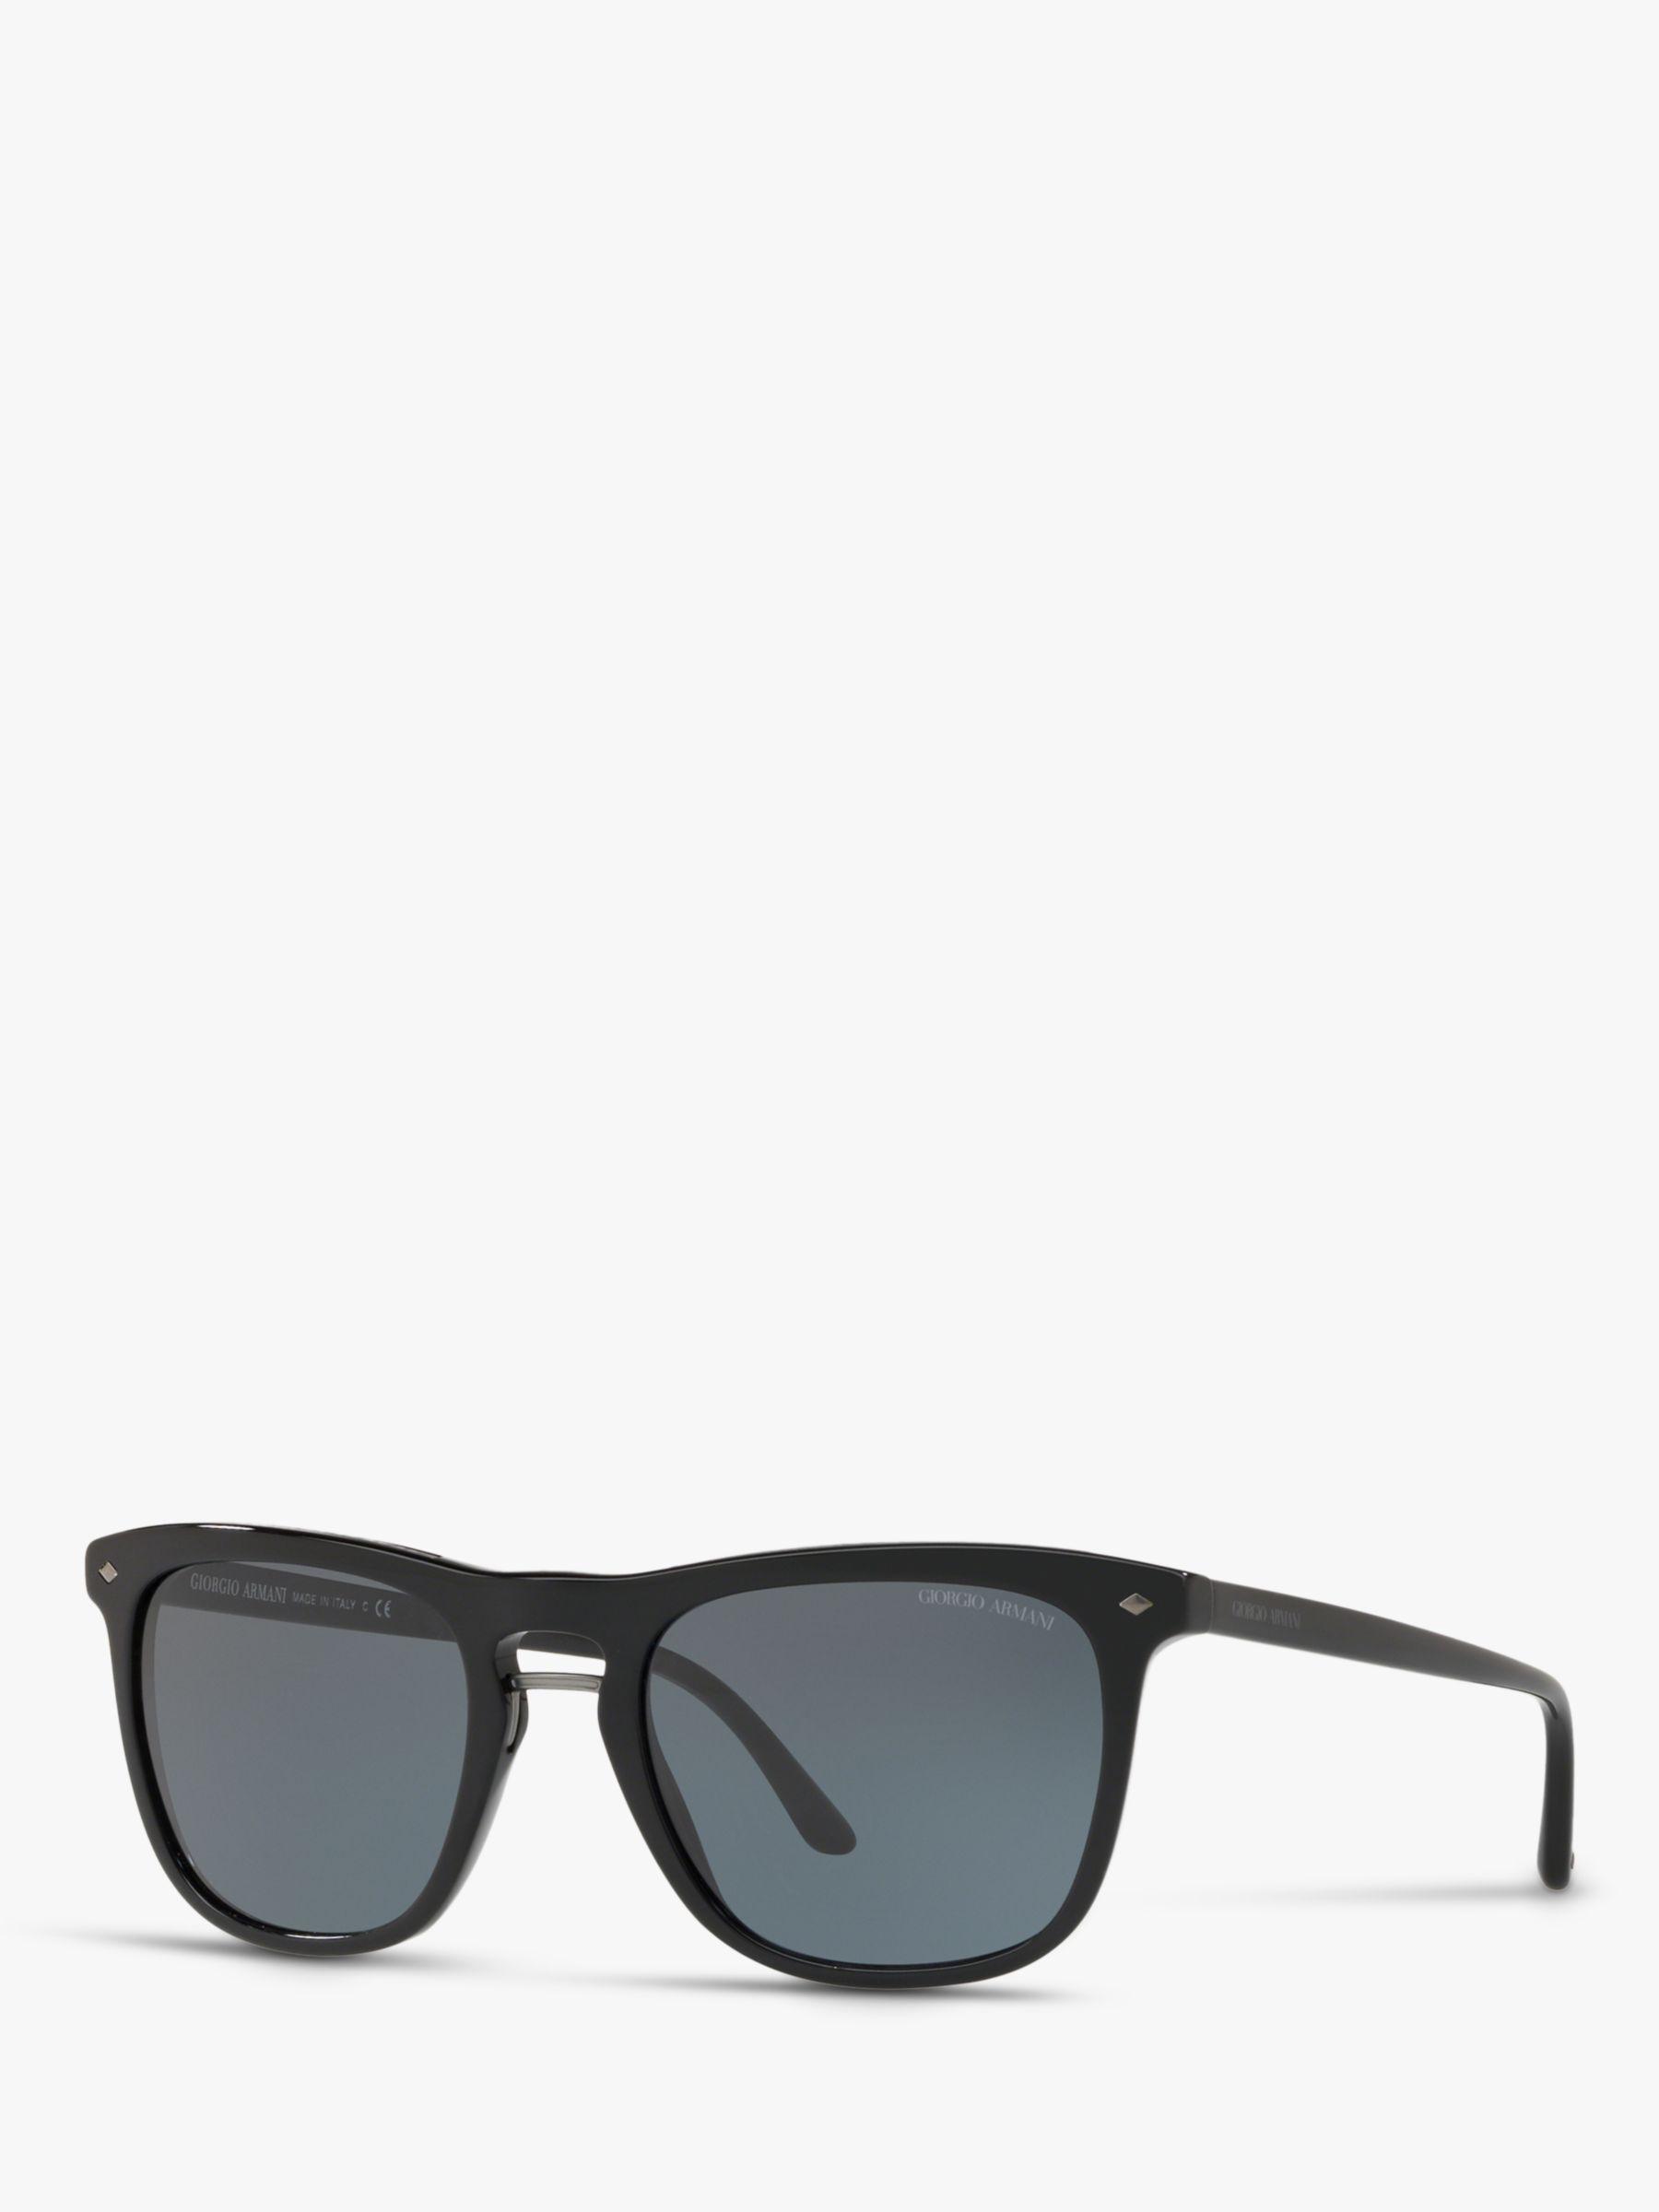 Giorgio Armani Giorgio Armani AR6040 Men's Frames of Life Square Sunglasses, Black/Grey